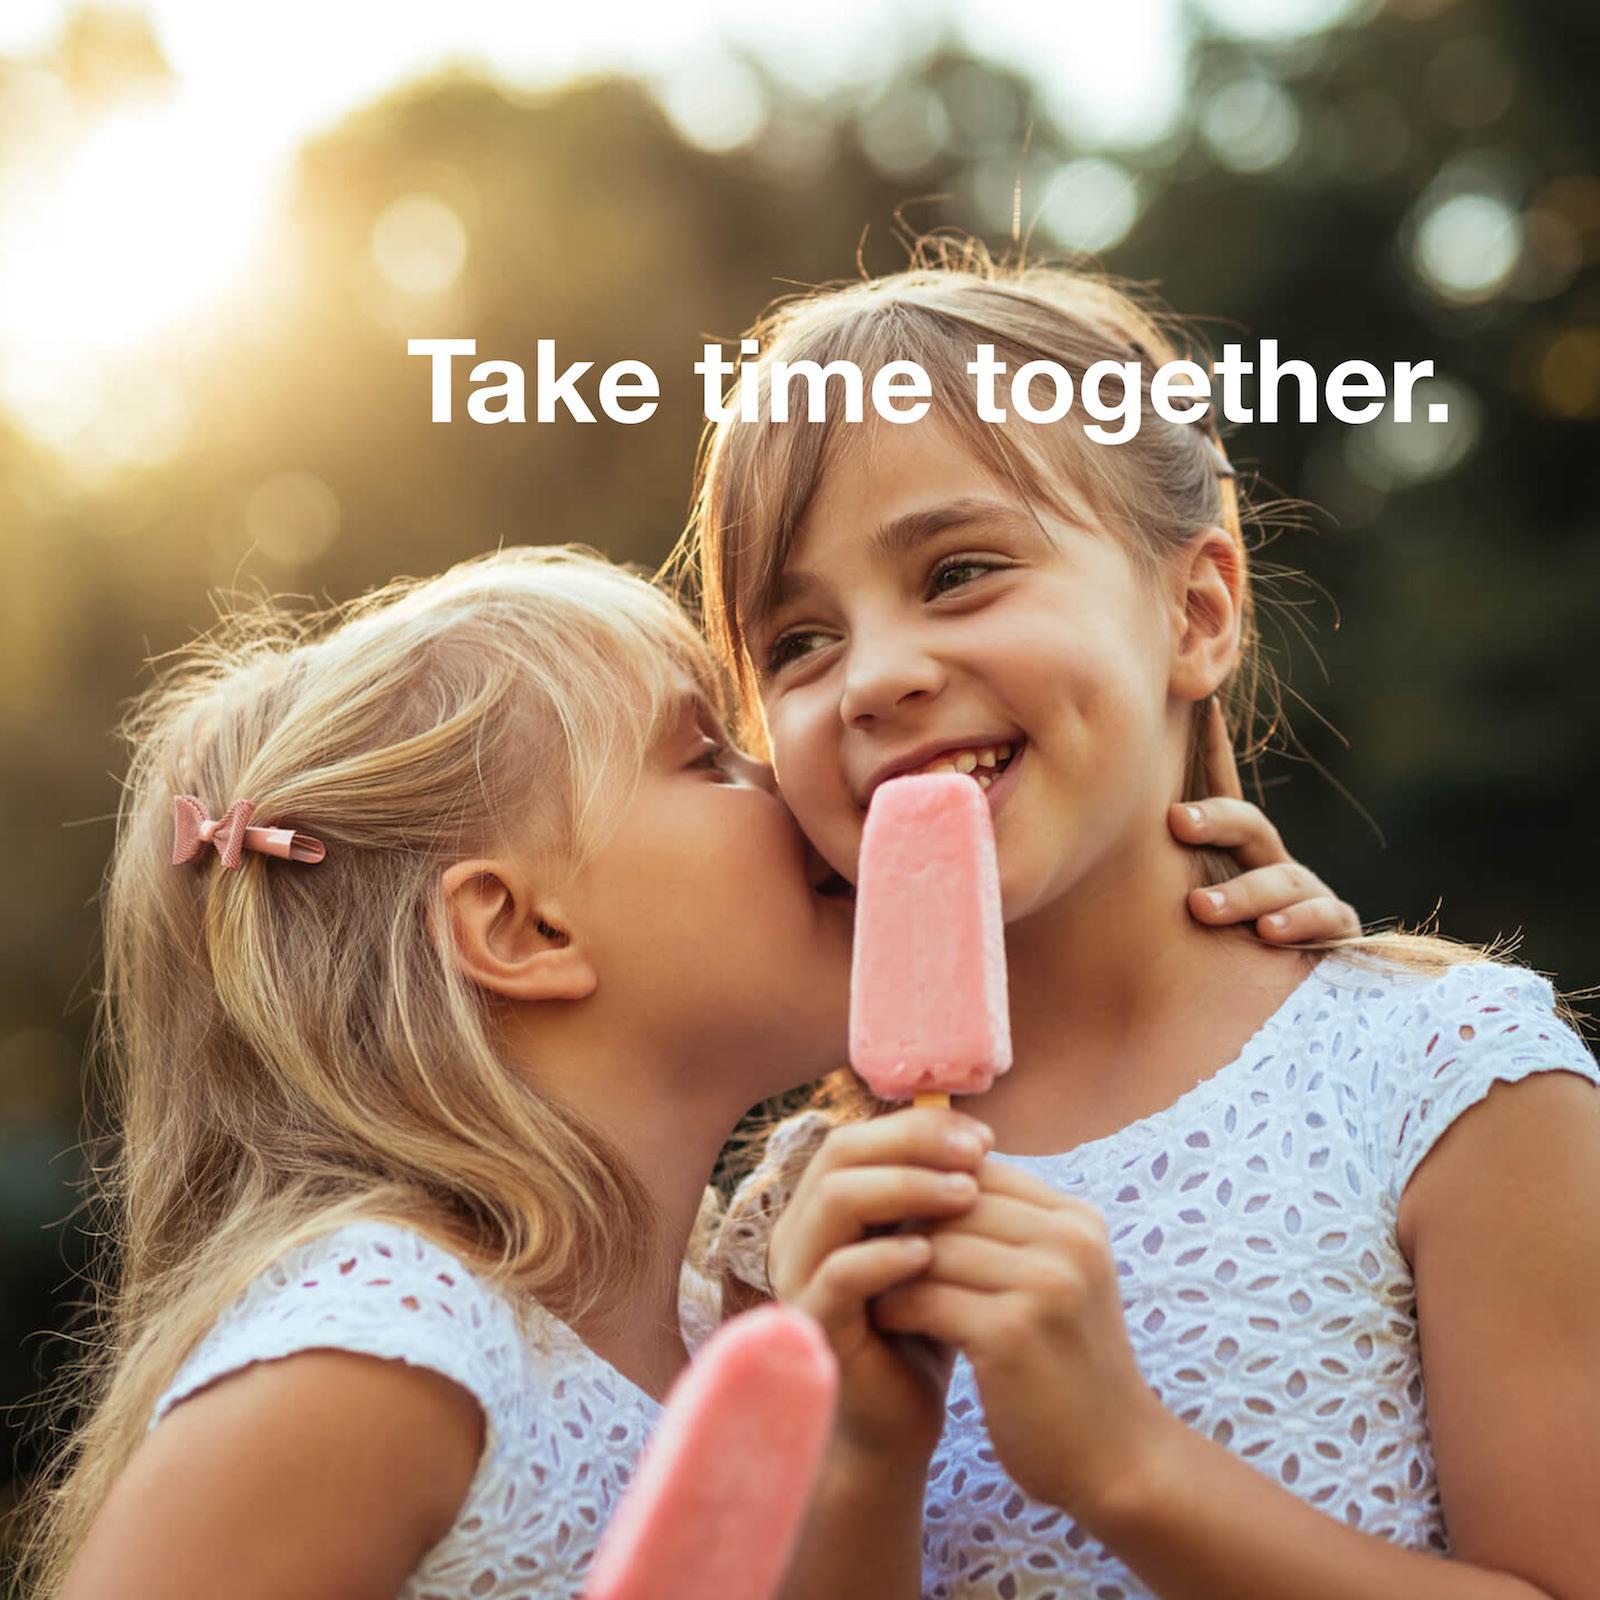 Take time together